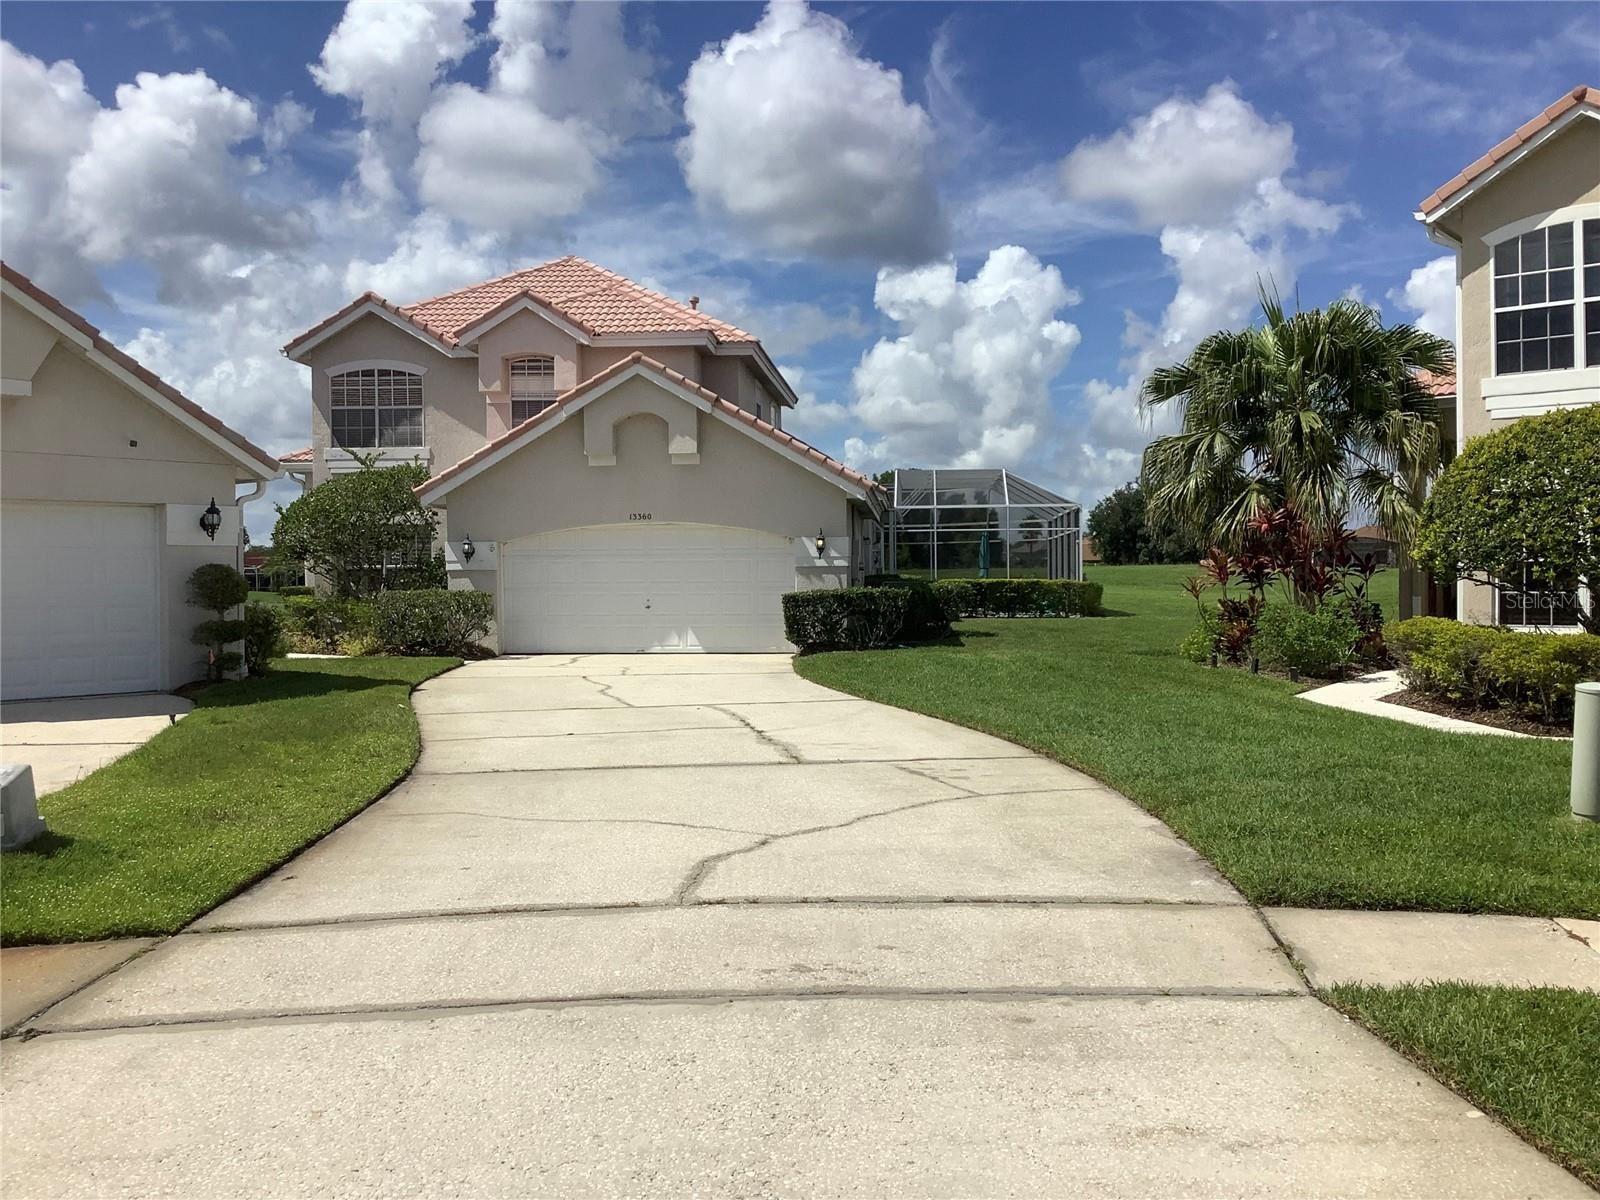 13360 LAKE TURNBERRY CIRCLE, Orlando, FL 32828 - #: O5959691